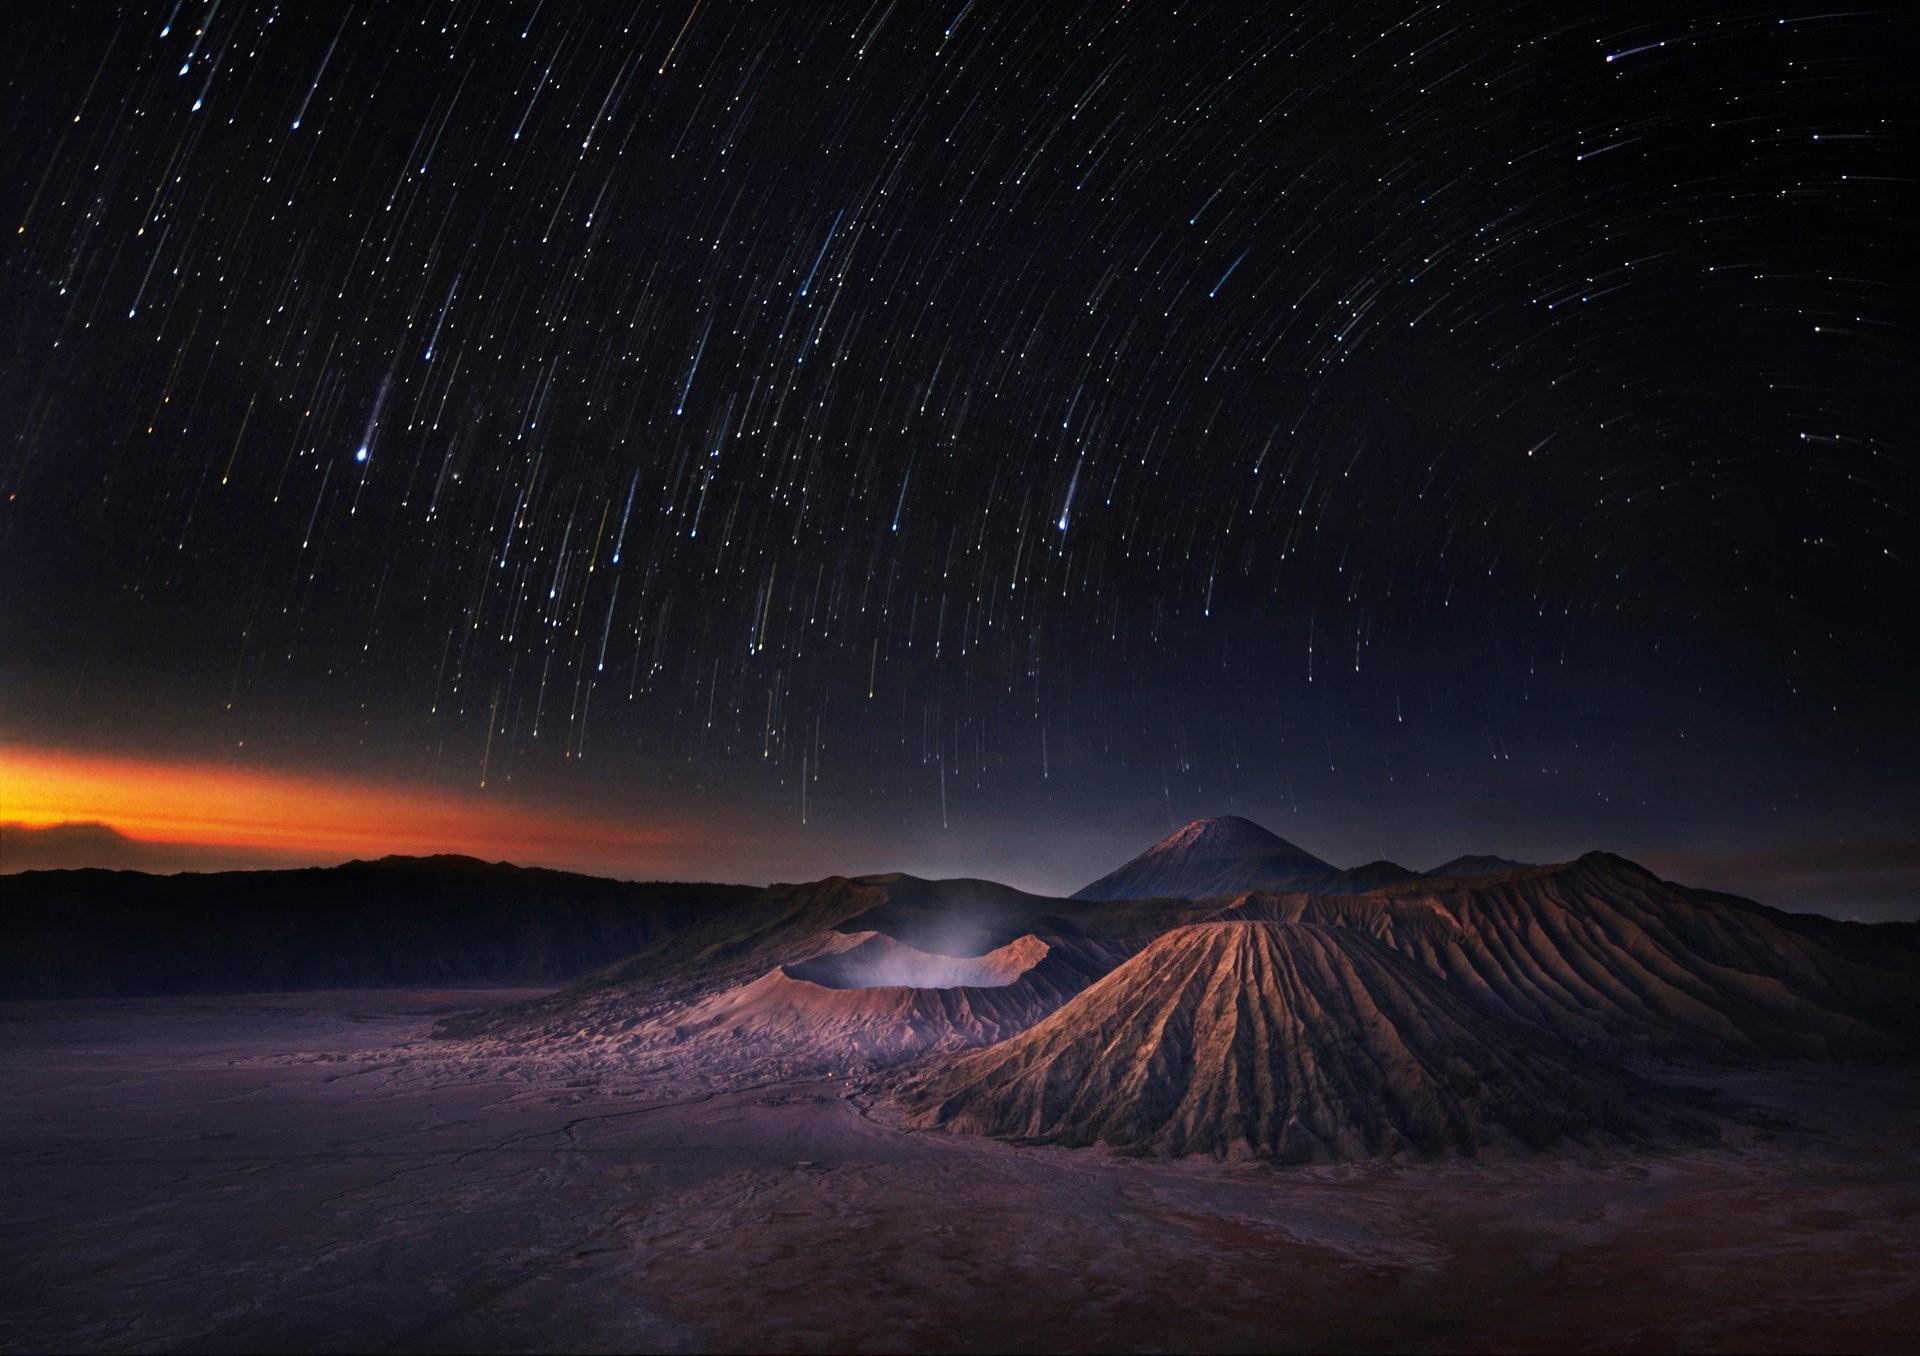 stars shooting stars universe night mountains sky space star shooting stars night  mountain sky space universe